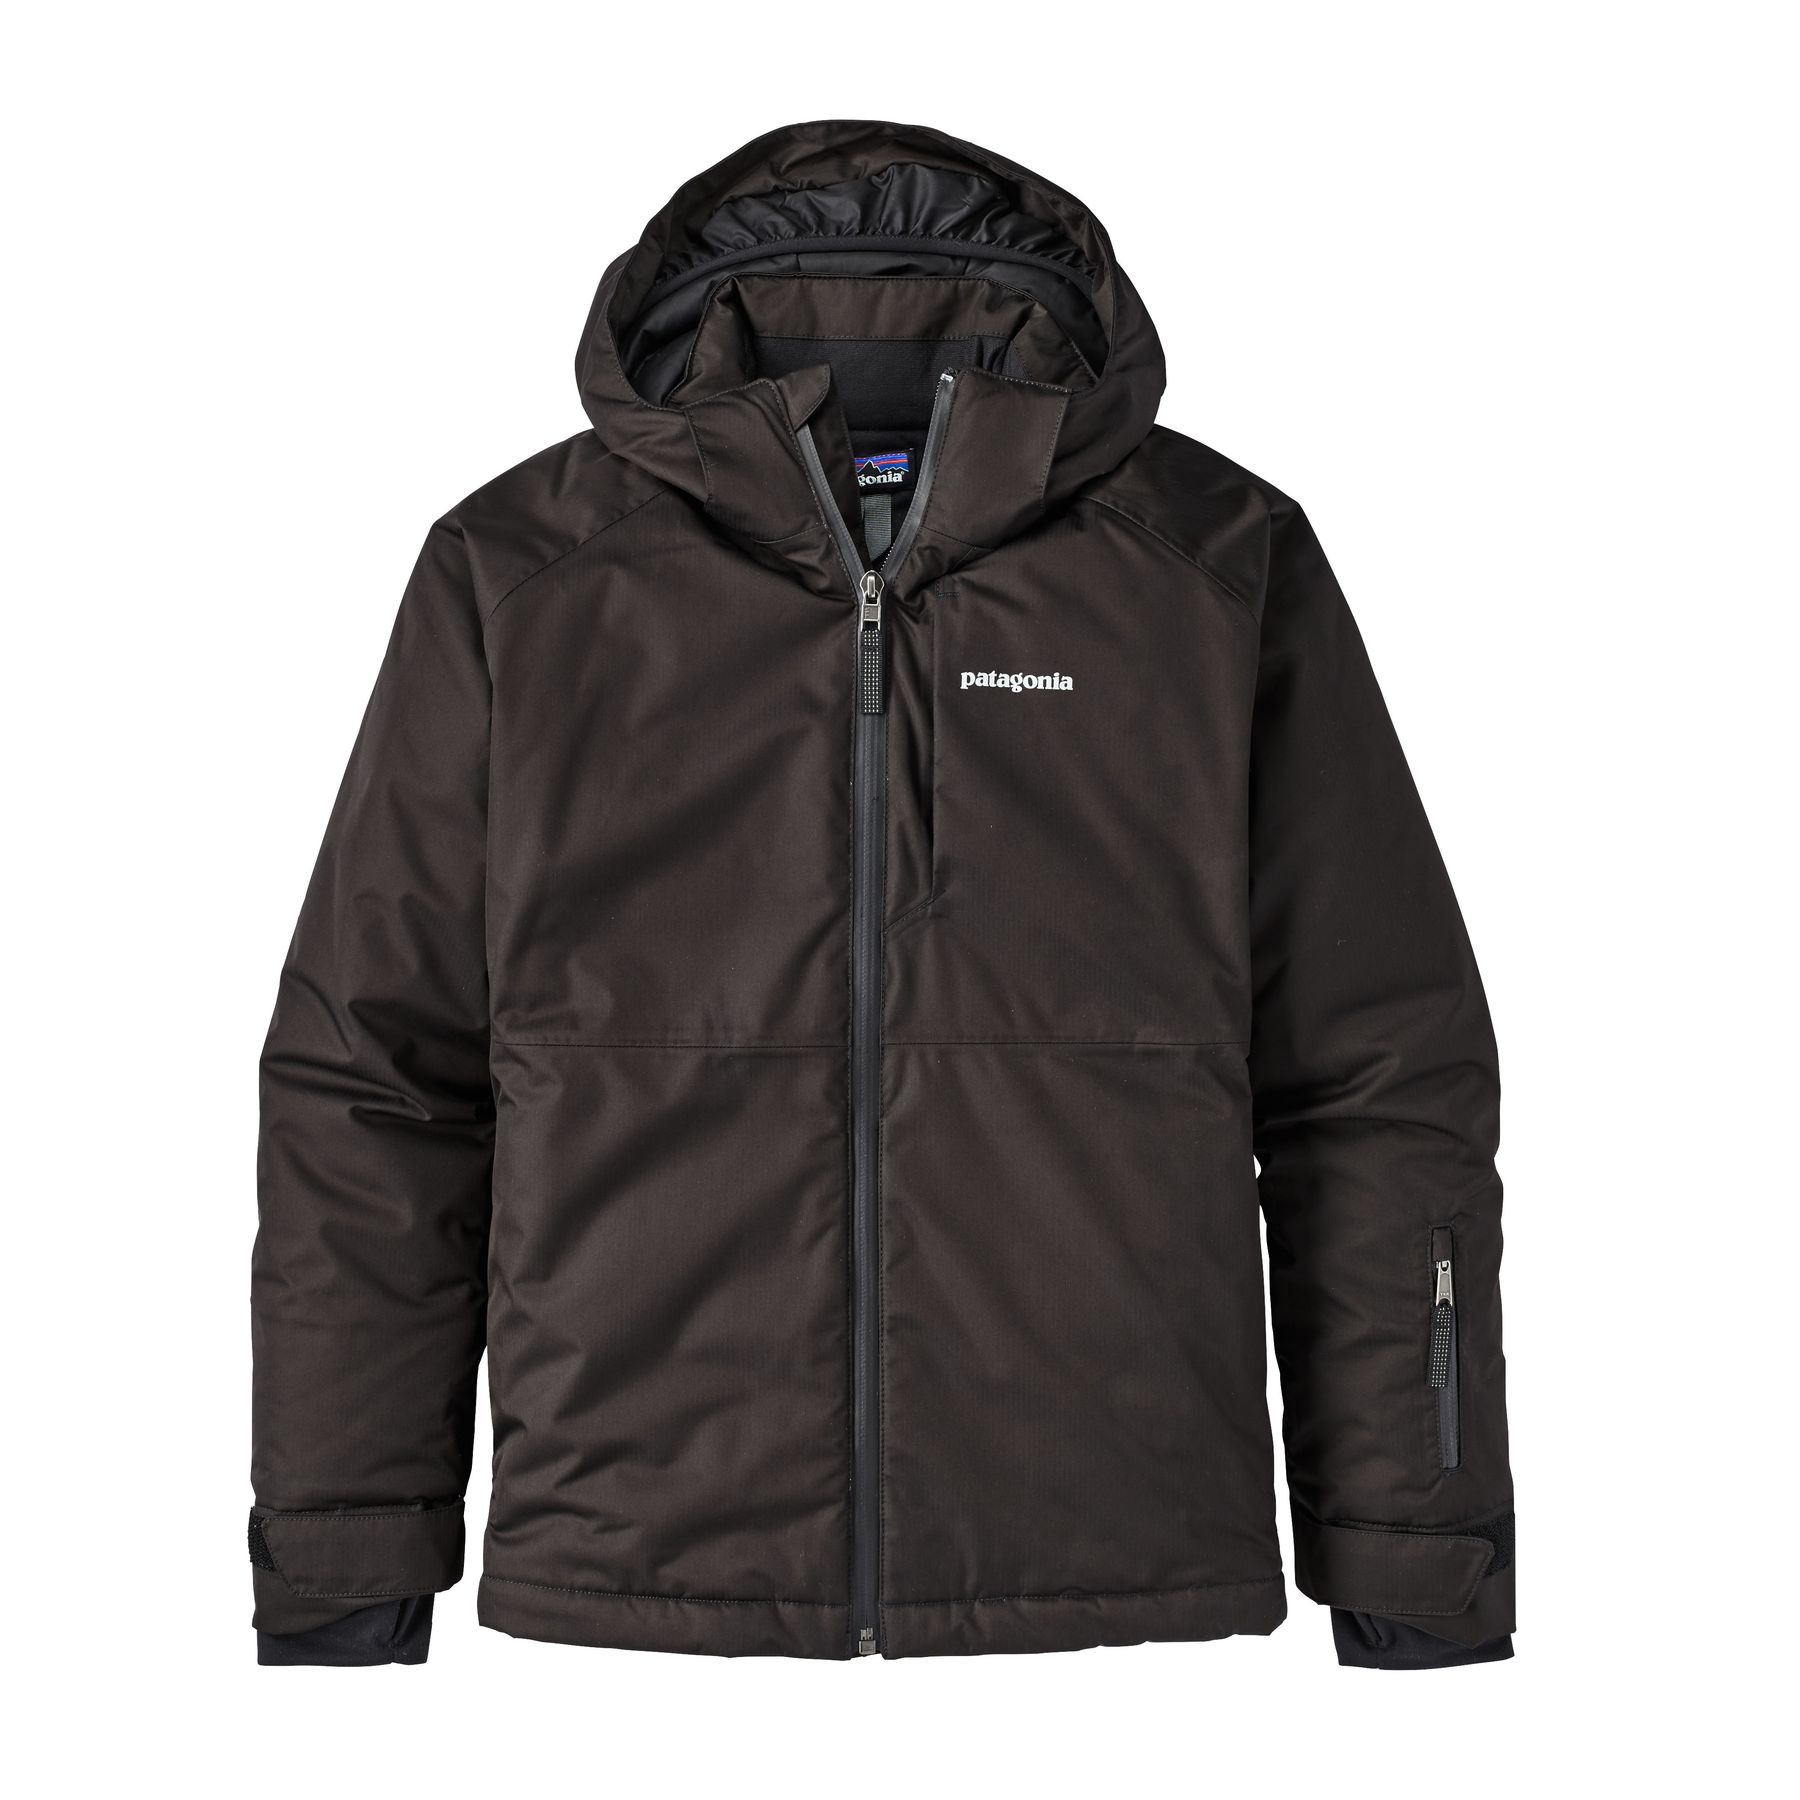 Patagonia - Boys' Snowshot Jacket - Ski jacket - Boys